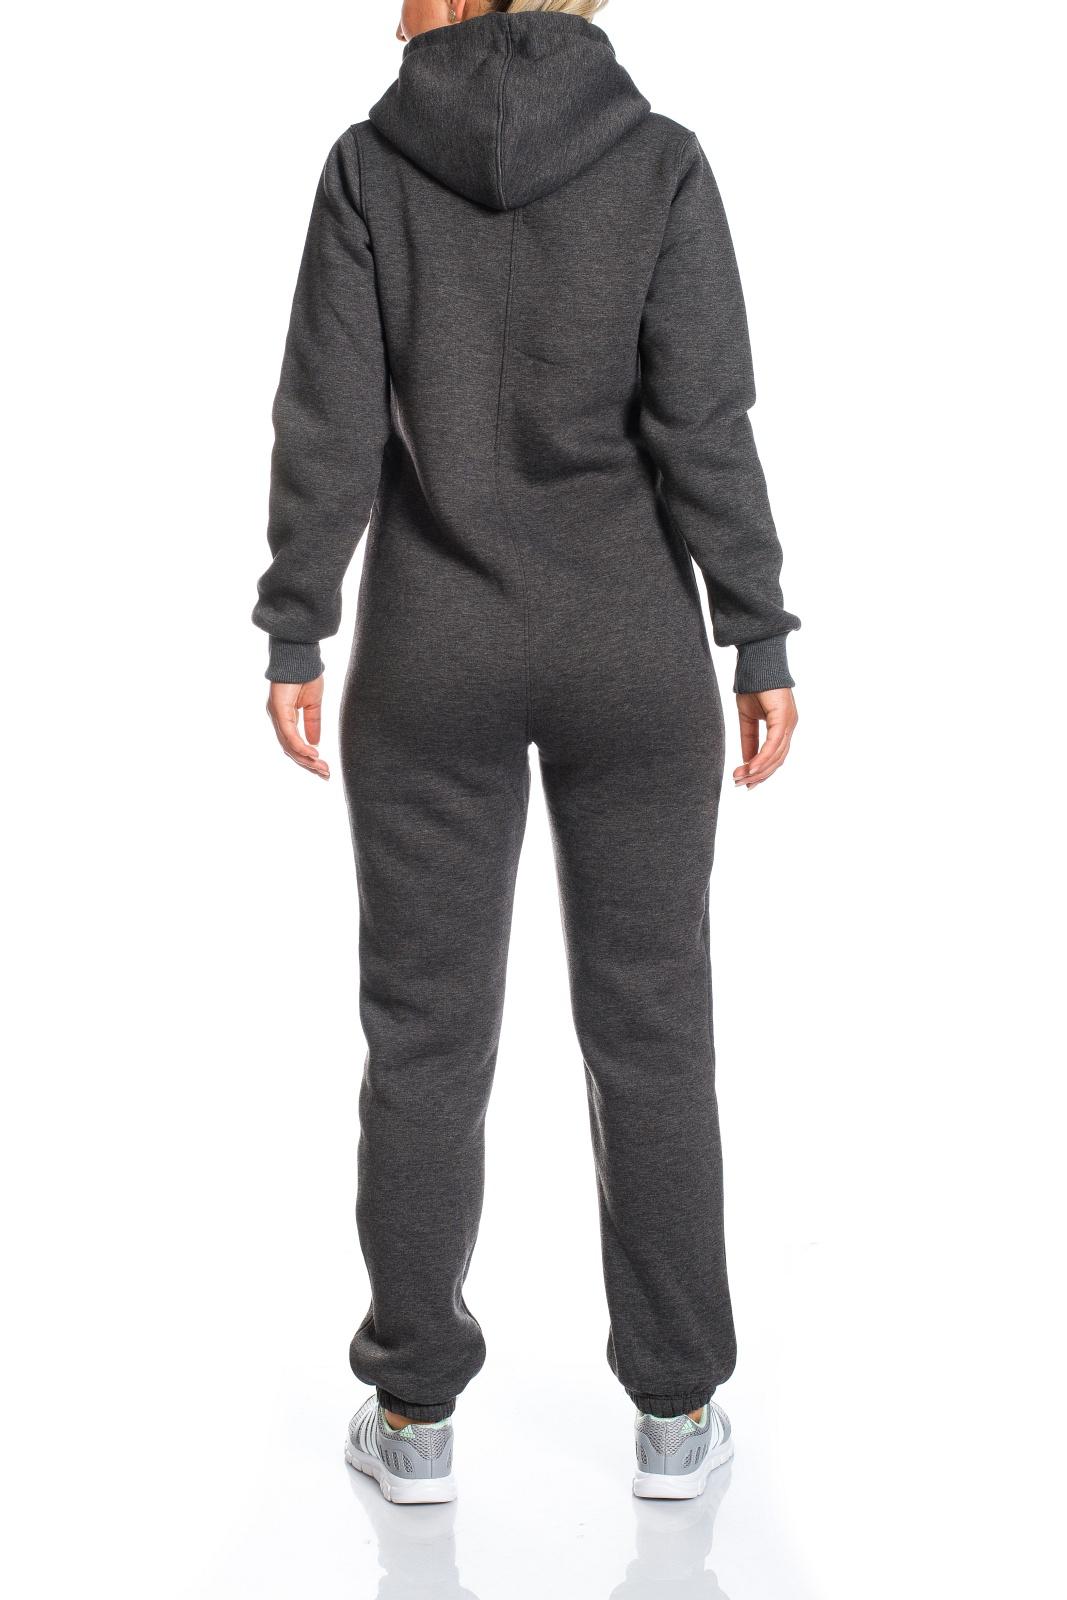 damen jumpsuit jogger jogging anzug trainingsanzug overall. Black Bedroom Furniture Sets. Home Design Ideas